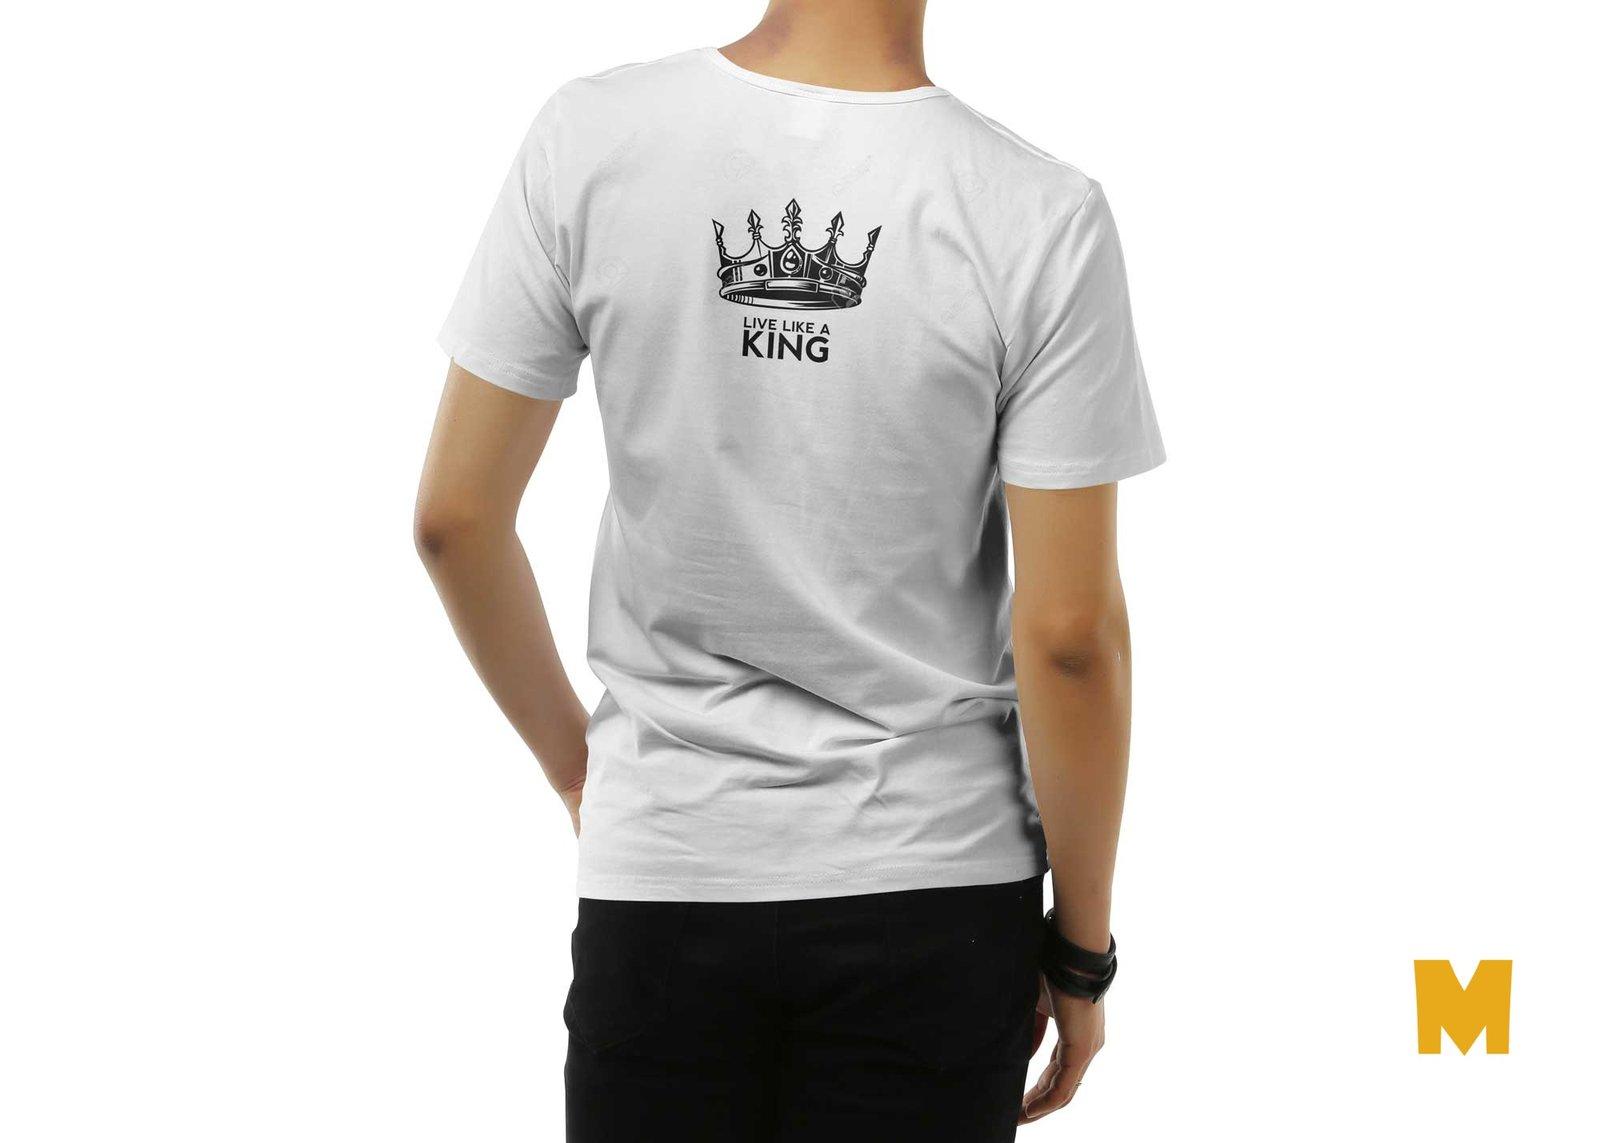 Free Back Tshirt Design Mockup